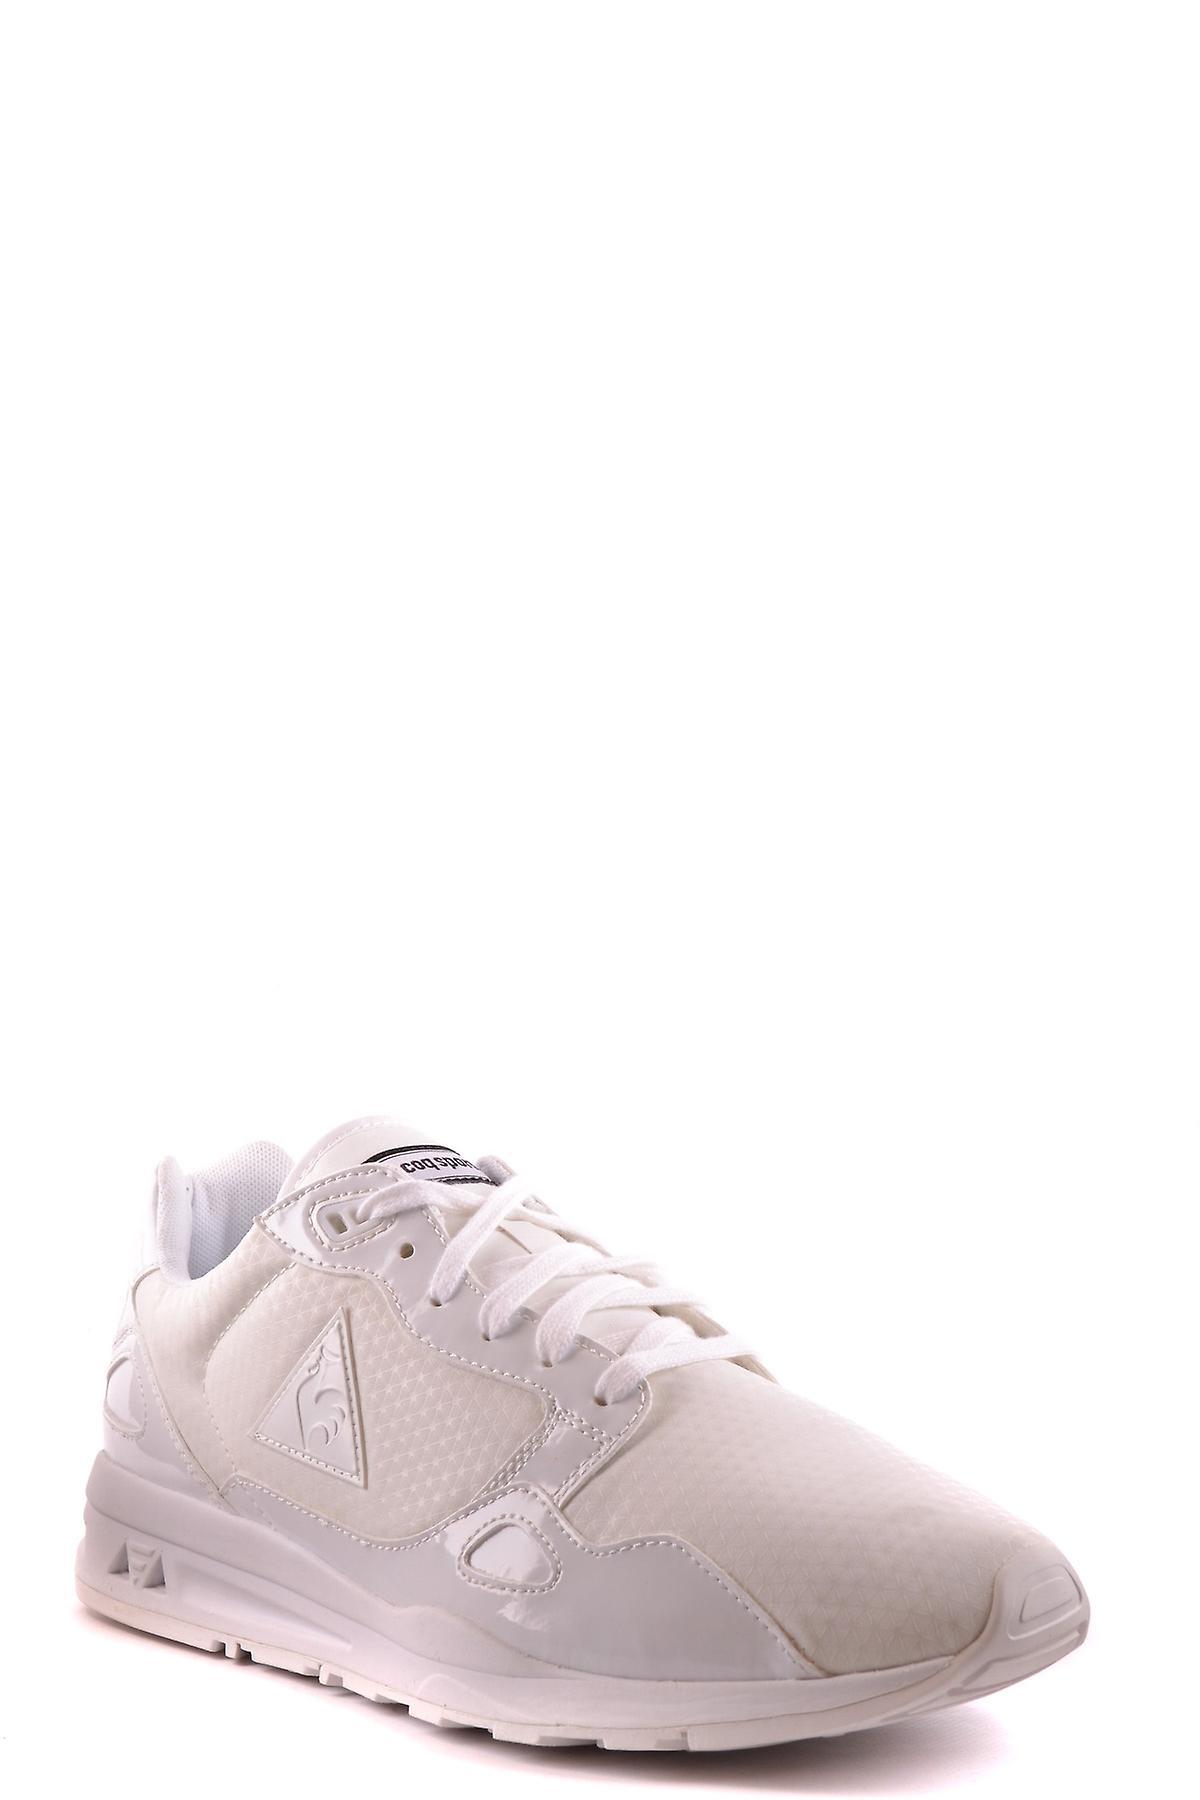 Le Coq Sportif Ezbc346001 Baskets en cuir blanc